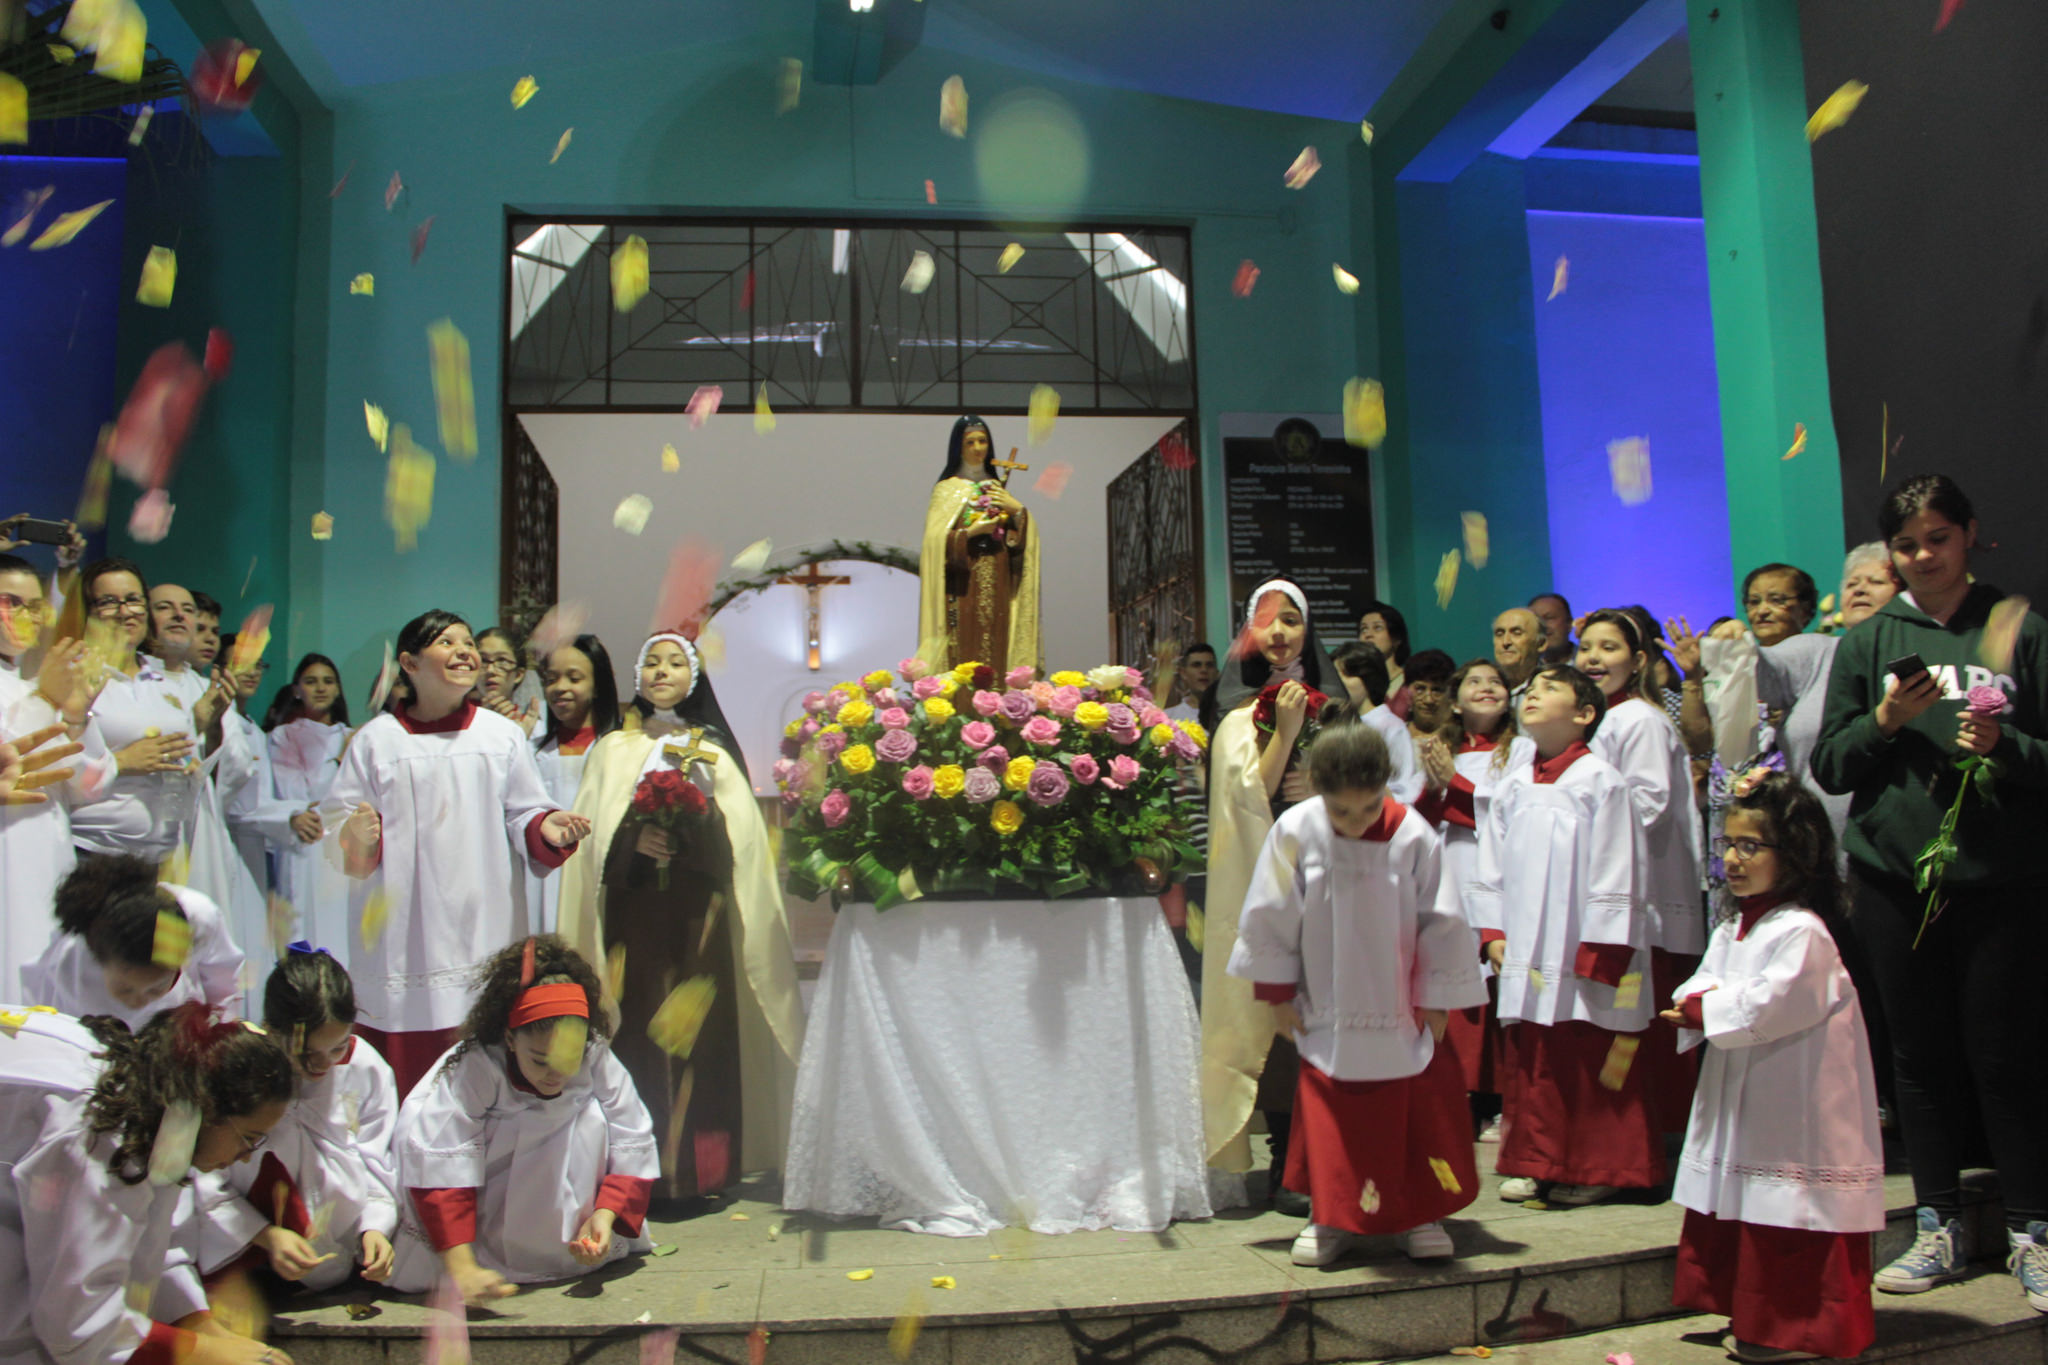 Festa da Padroeira Santa Teresinha